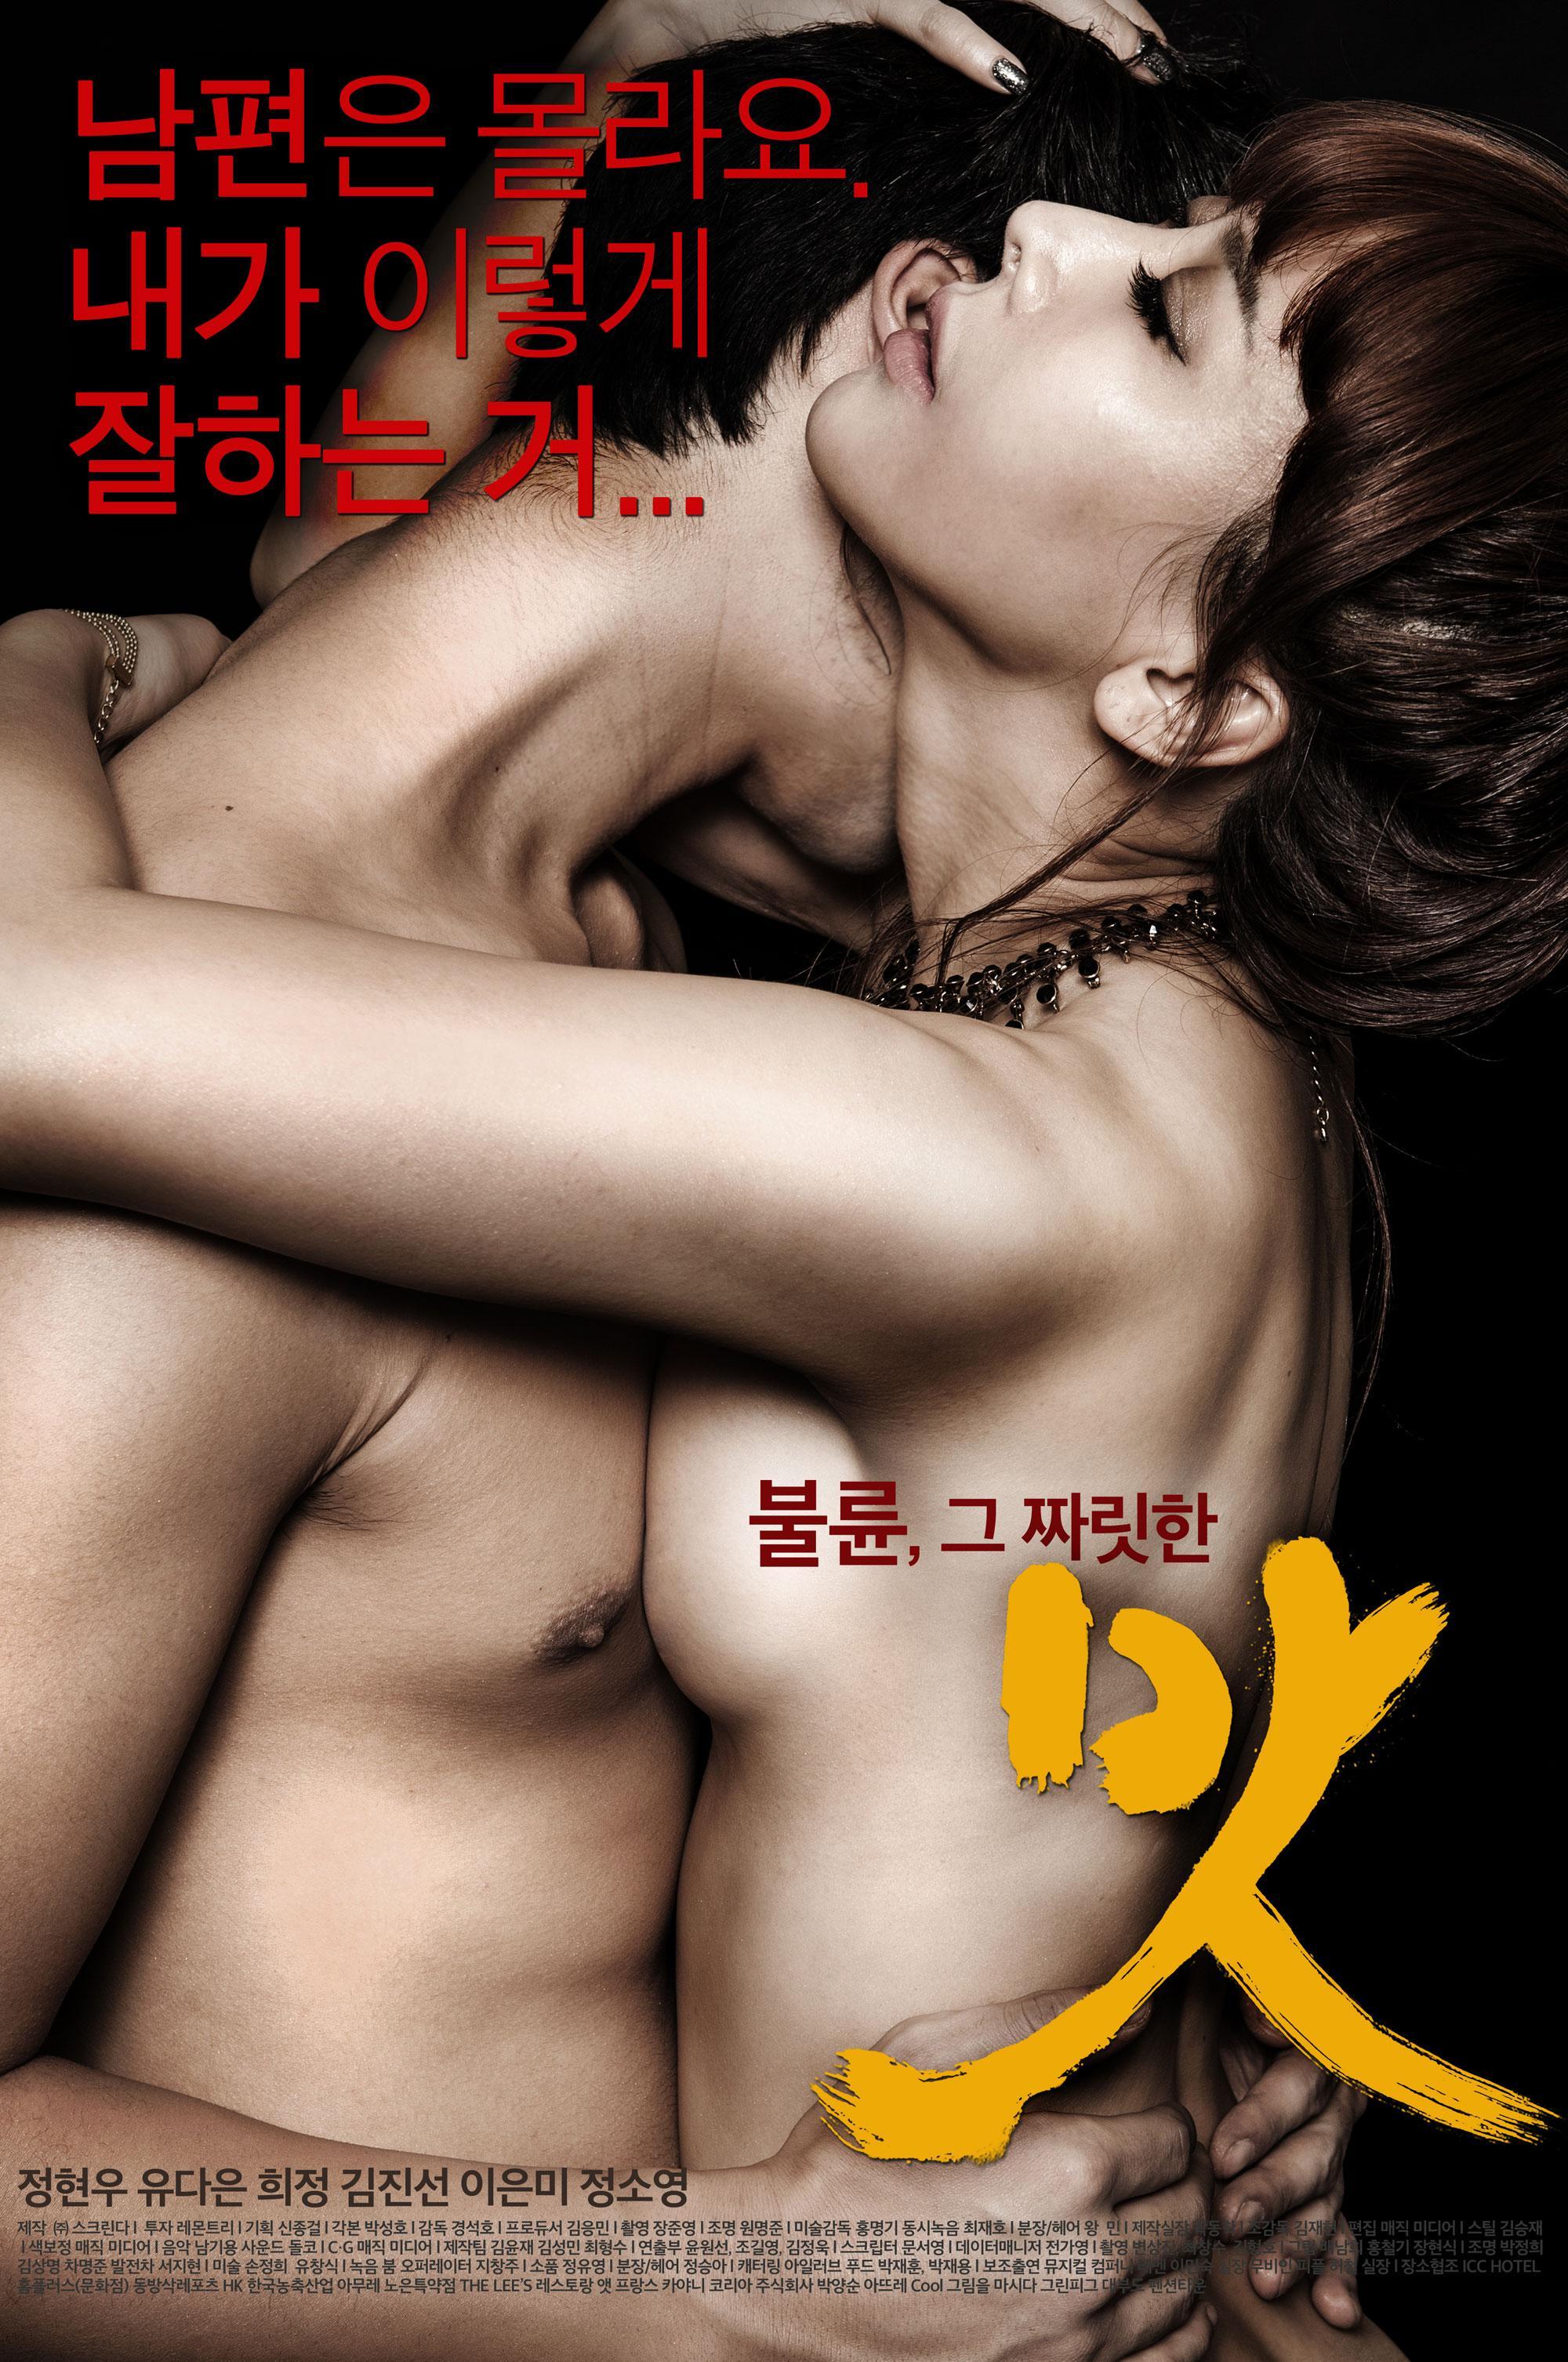 Alluc Porn Bideos korean adult movies - hardcore videos